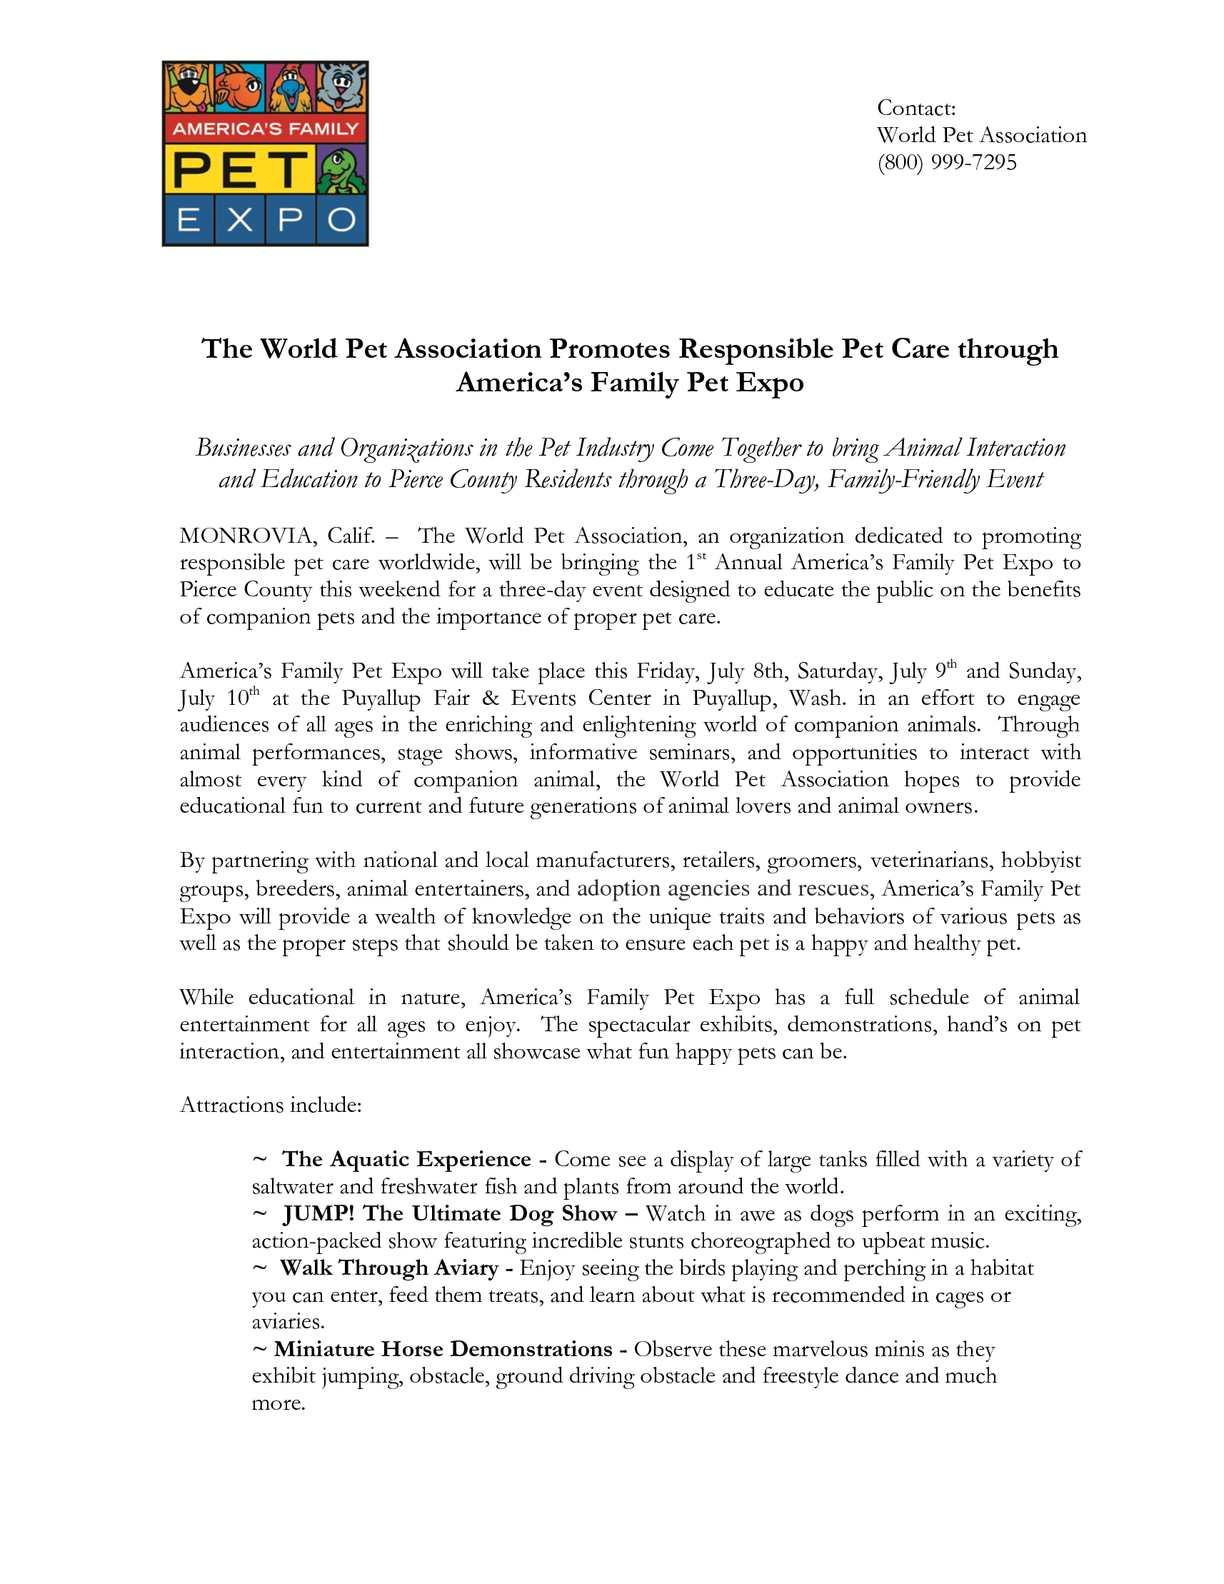 family friendly organizations